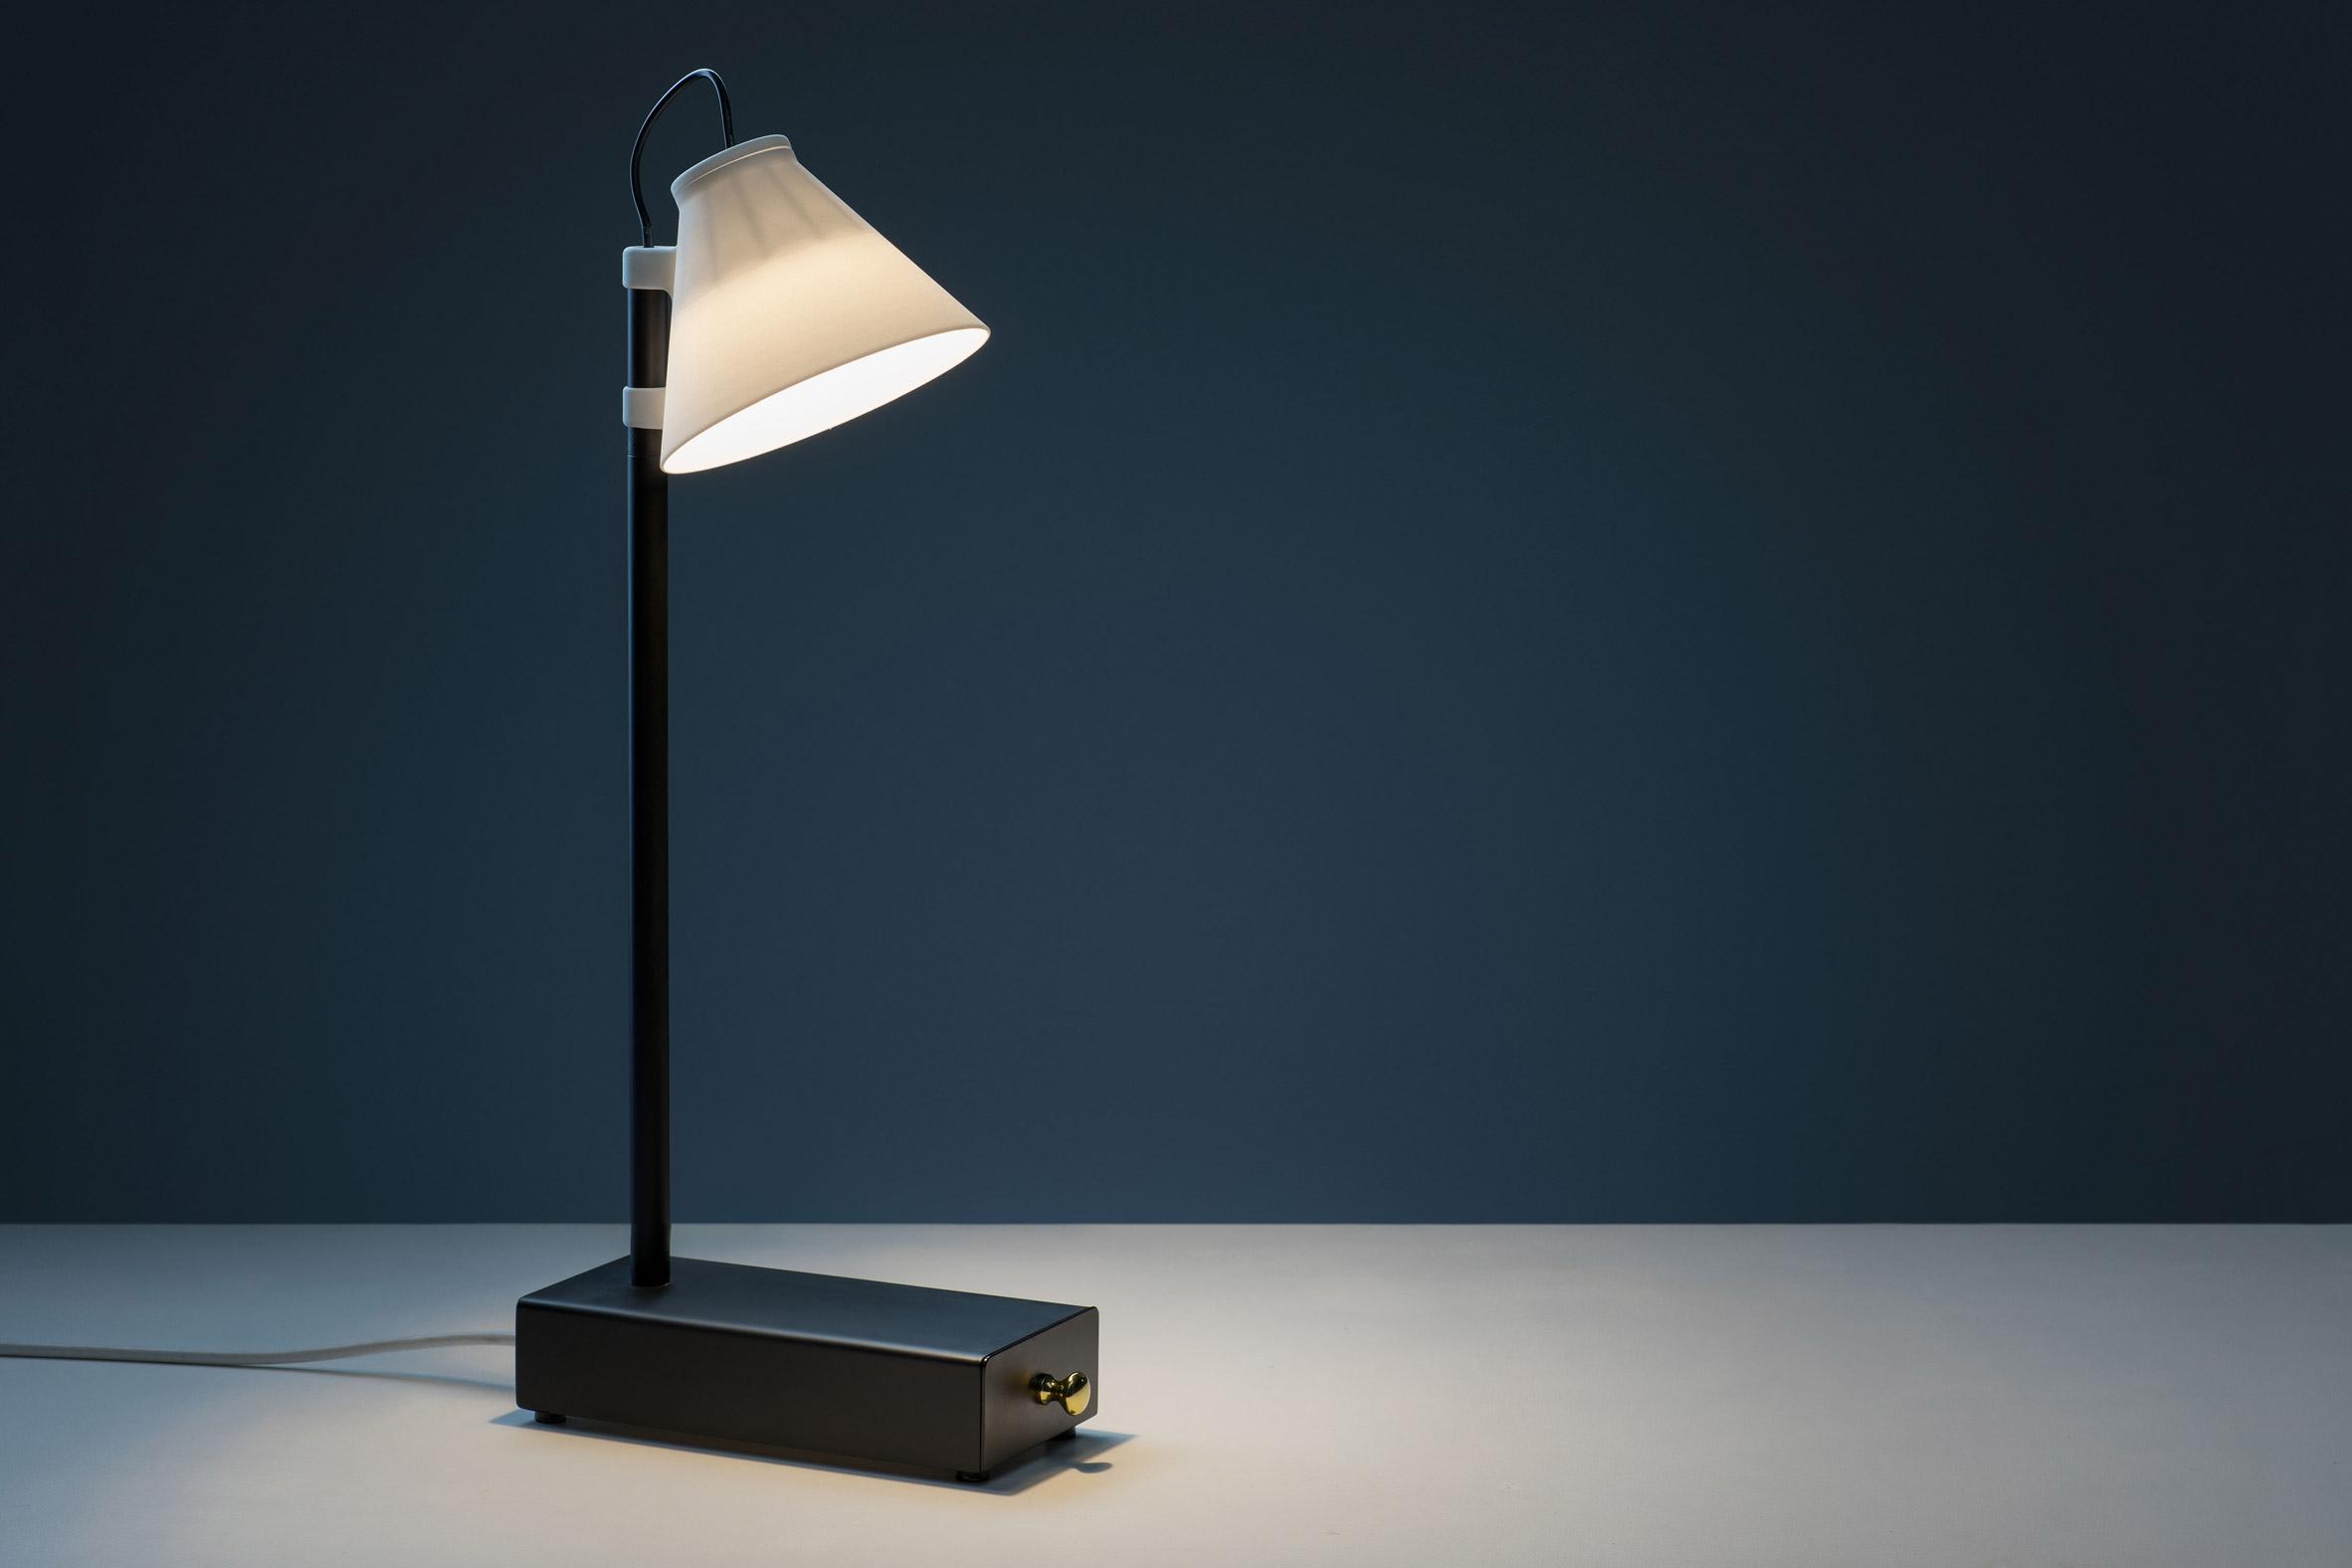 Klemens Schillinger's Offline lamp illuminates in exchange for a smartphone